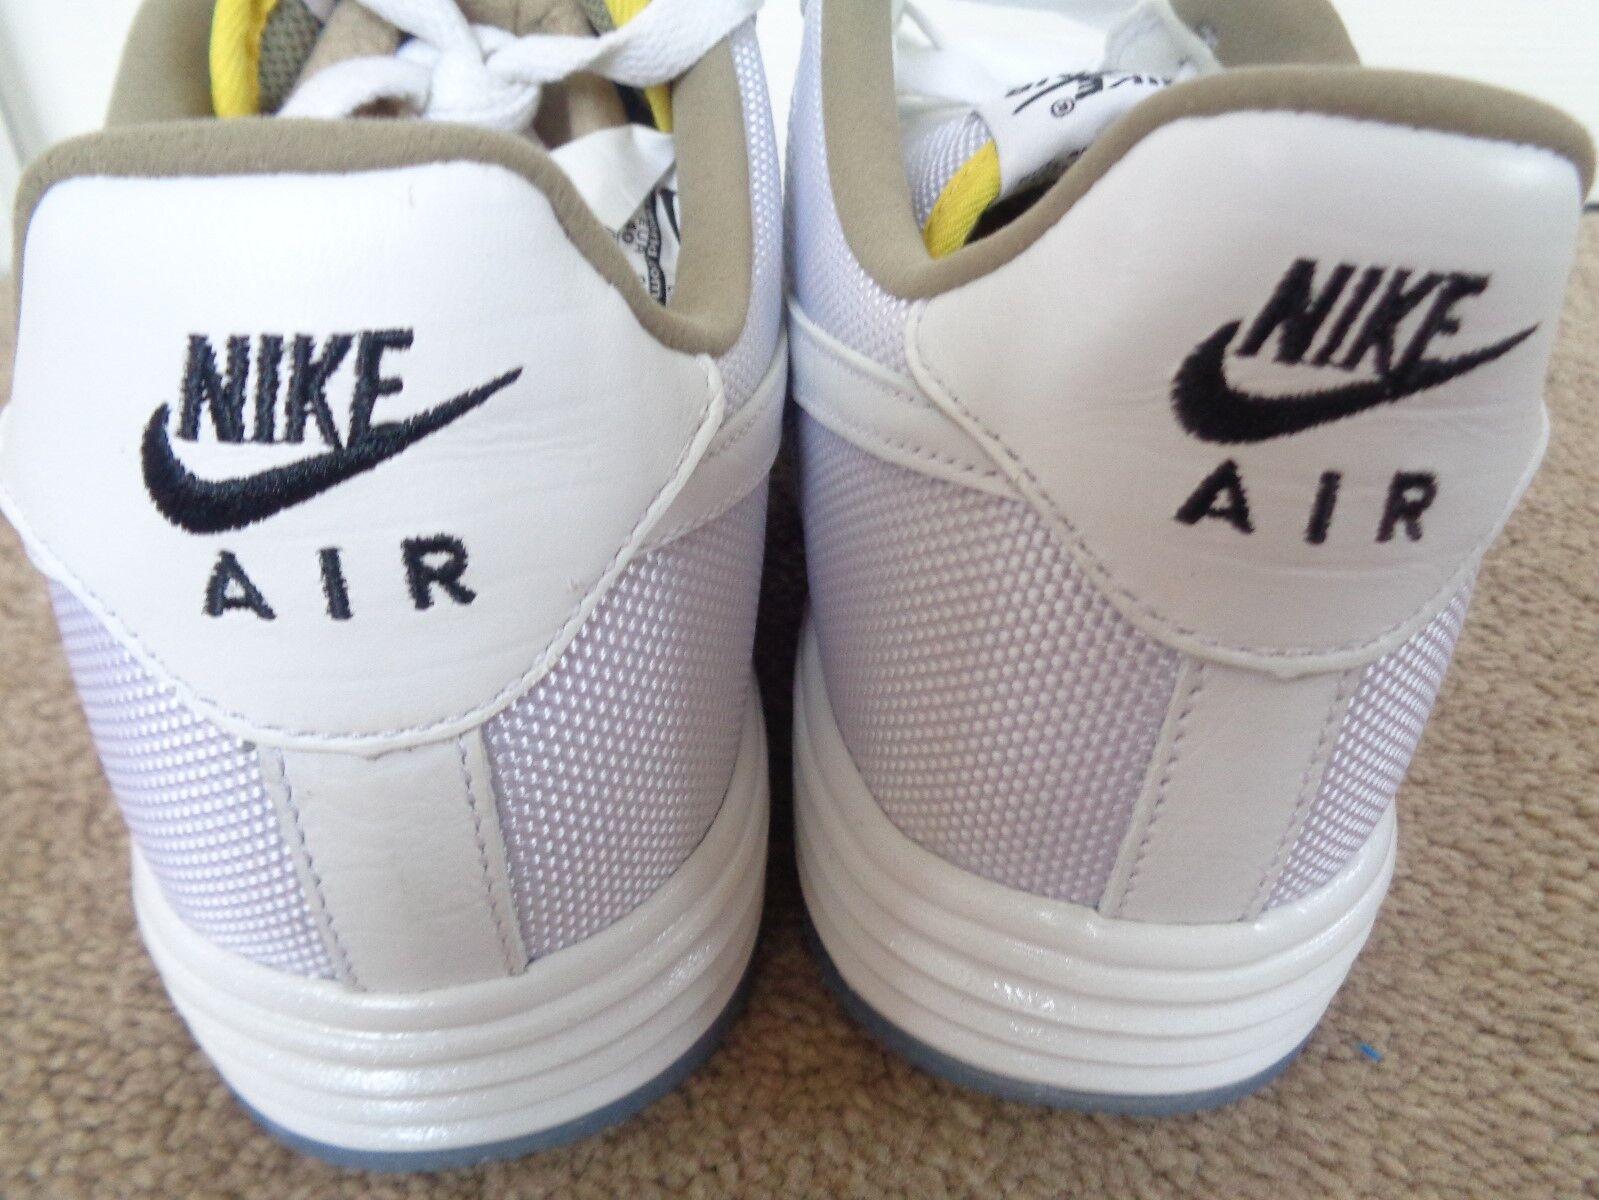 Nike lunar Obliger 1 QS homme  trainers Baskets uk 635274 100 uk Baskets 6 eu 40 us 7 NEWBOX bd207a